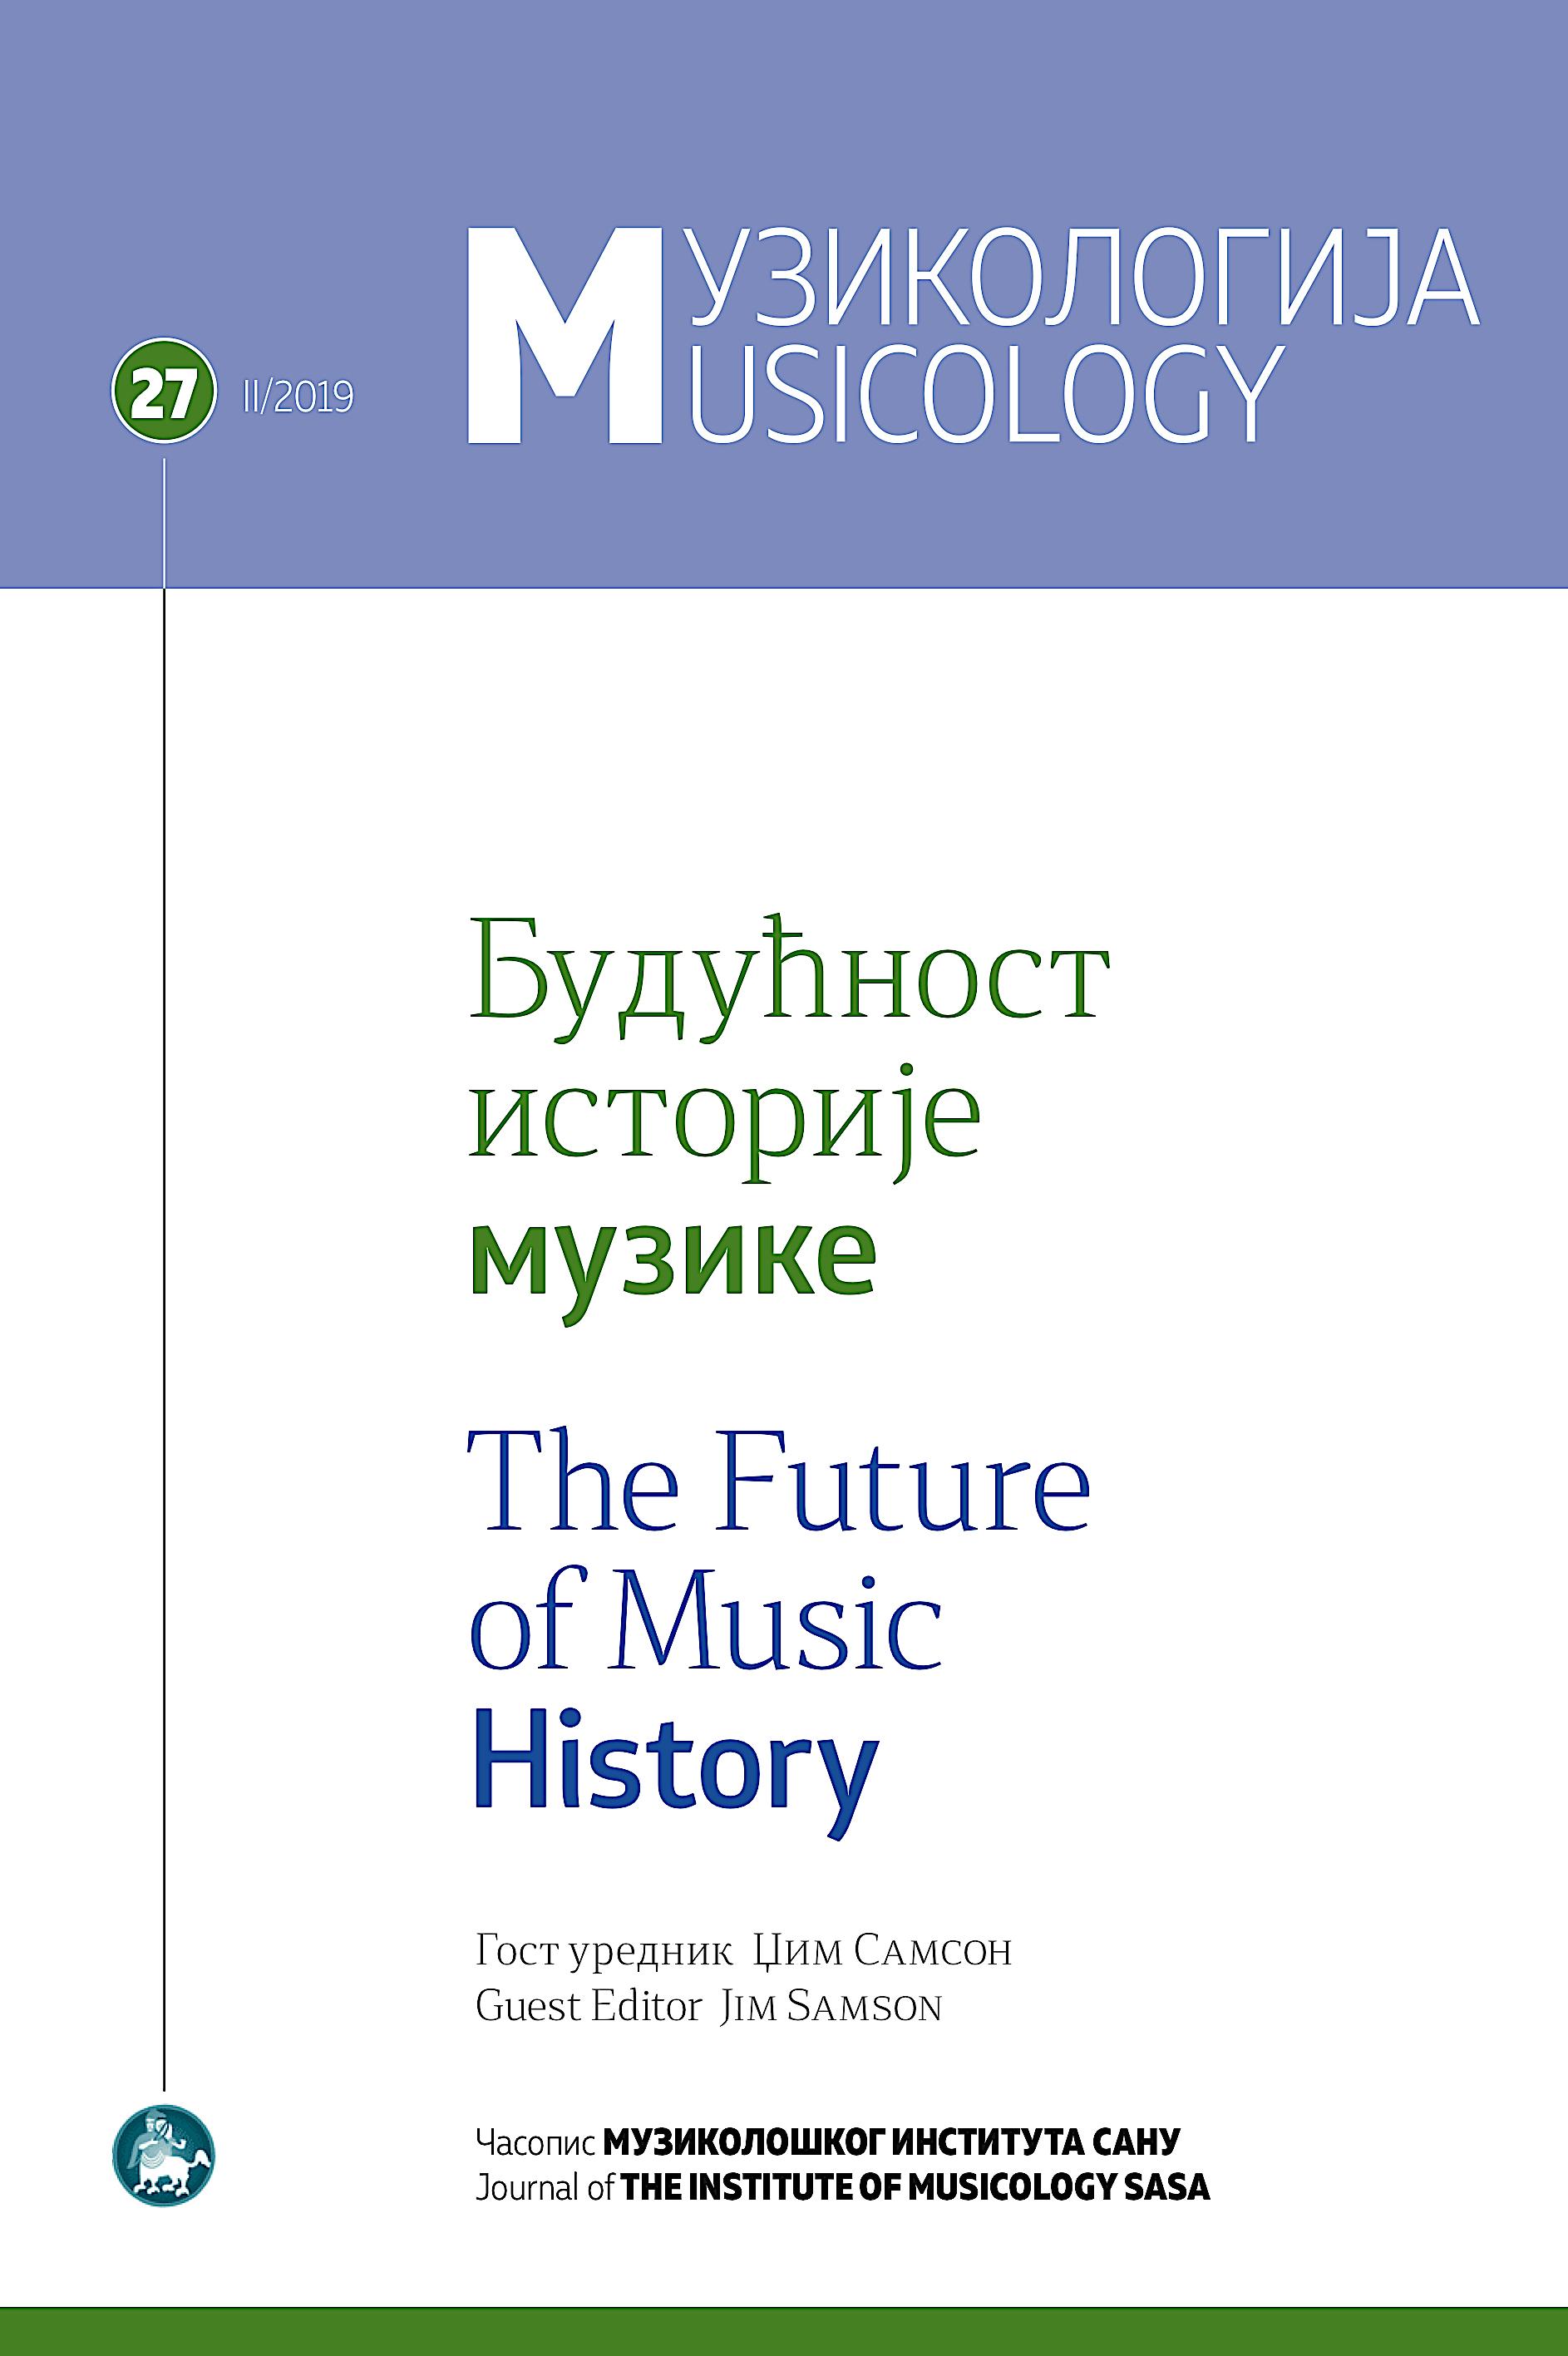 Musicology 27